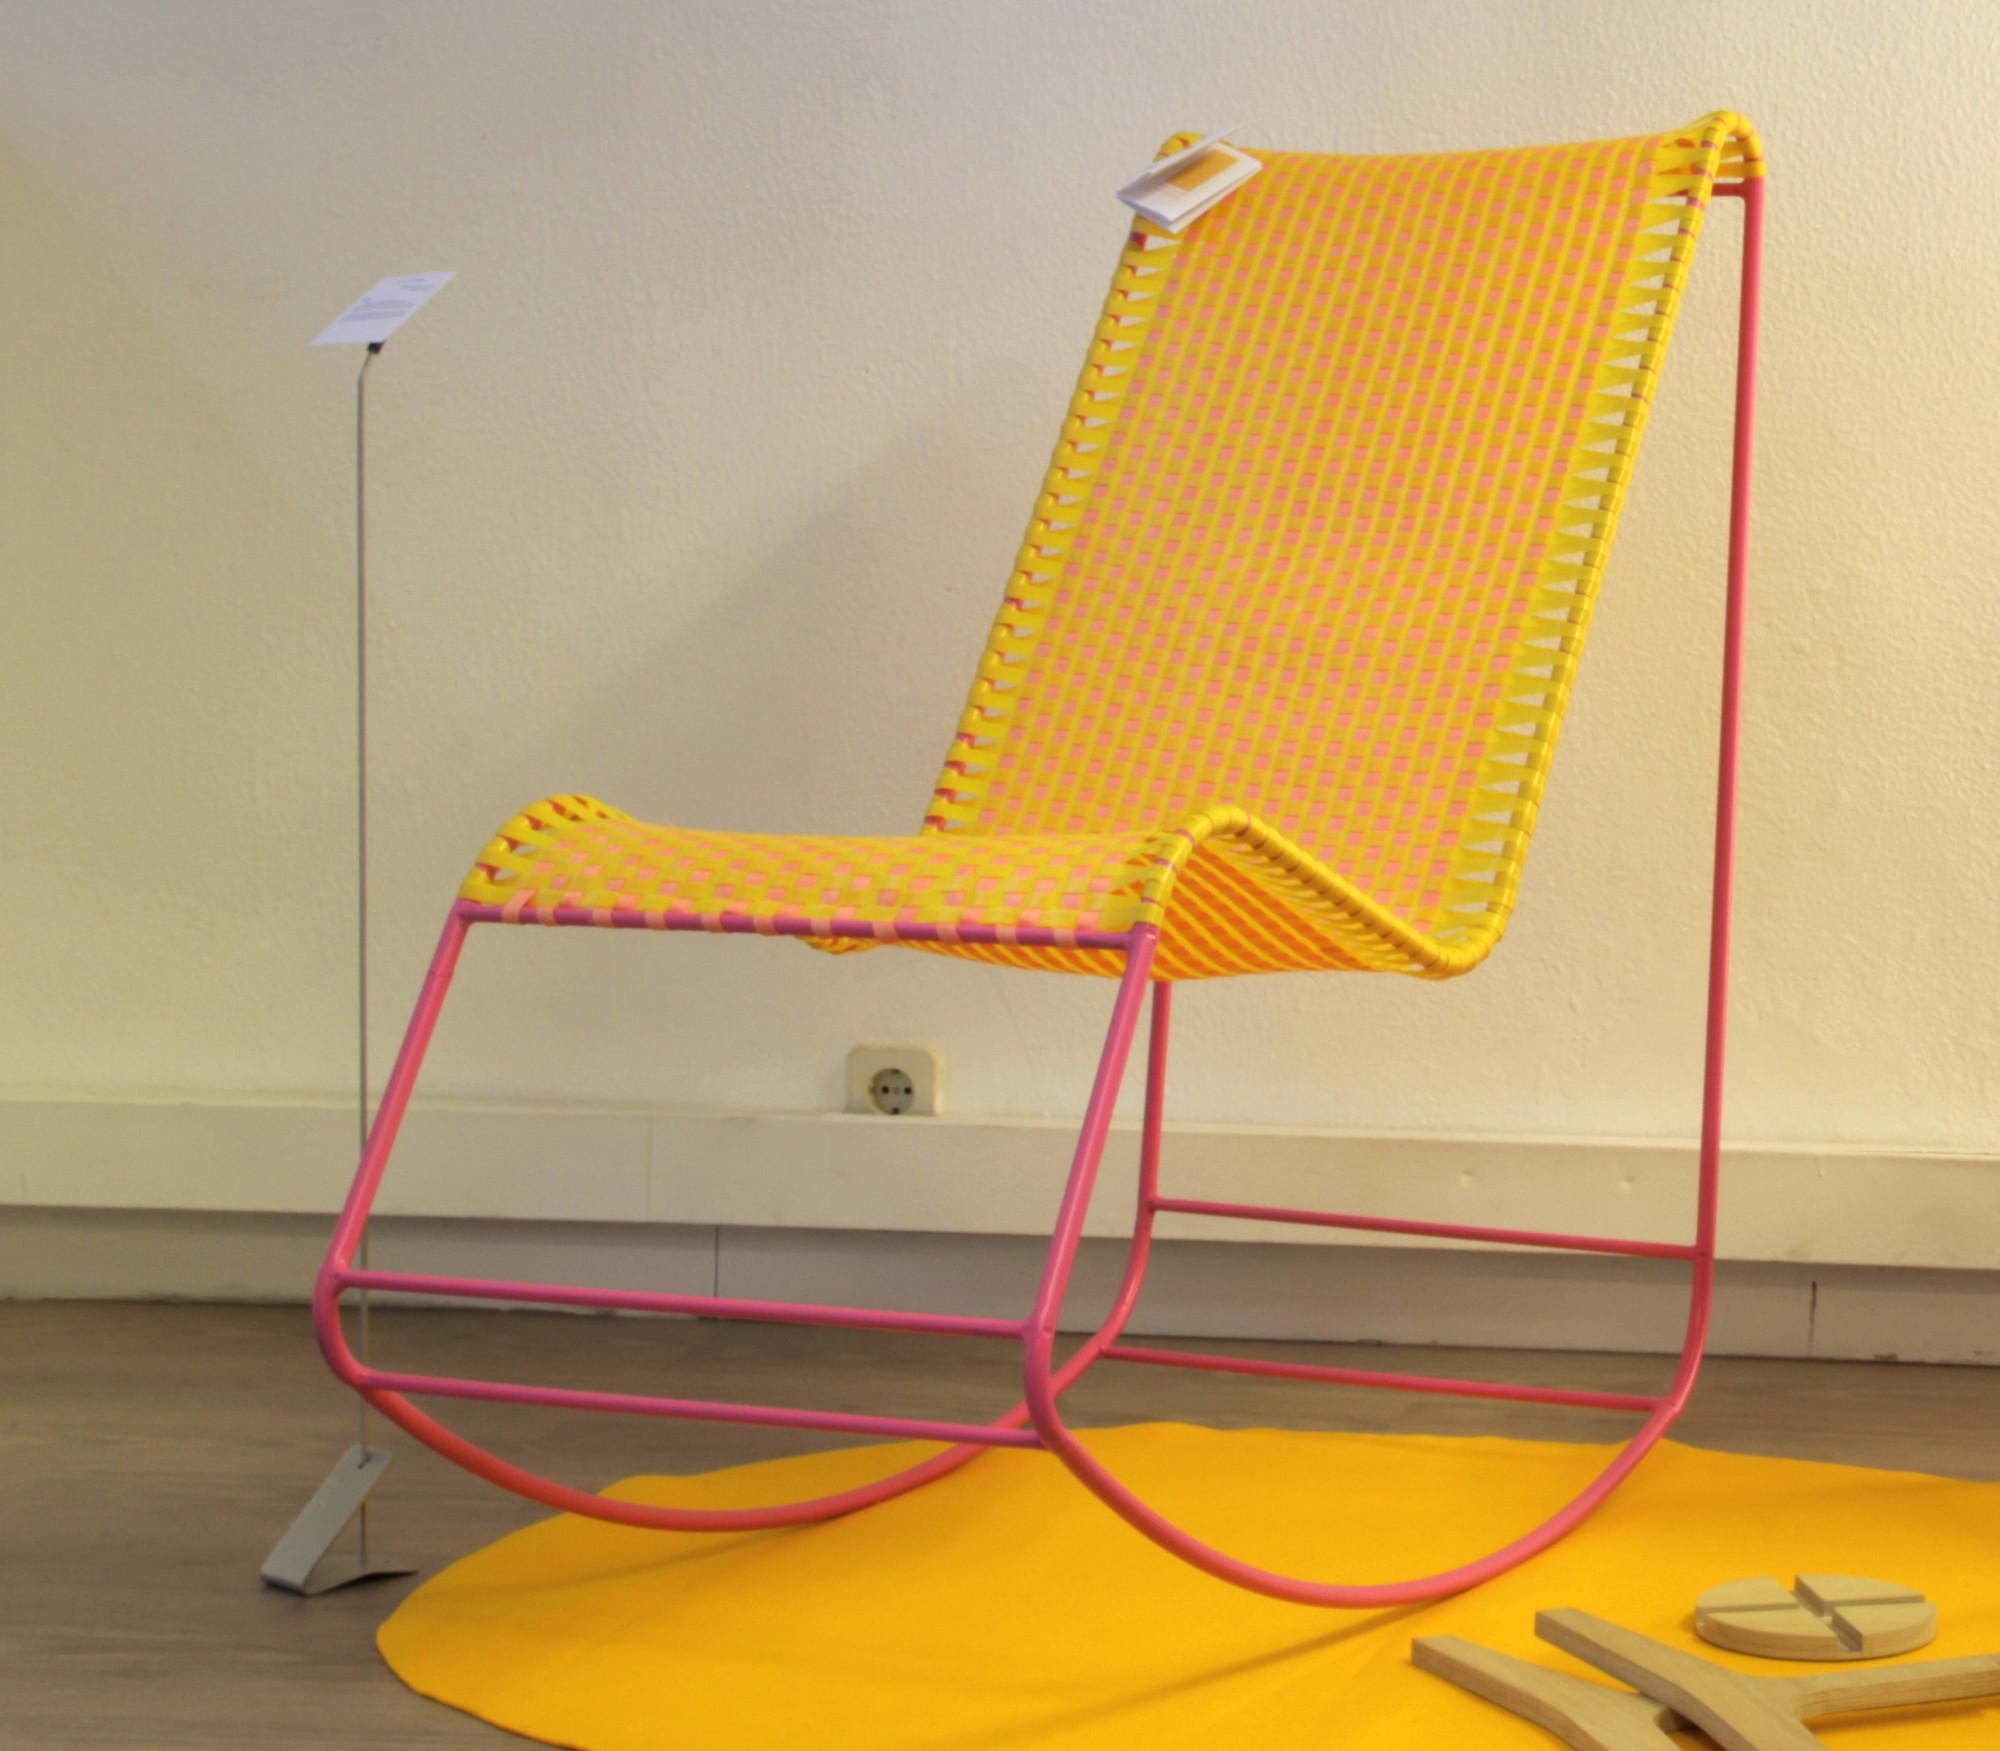 Mecedorama arquitectura y dise o zunchado archdaily per for Fabricantes sillas peru